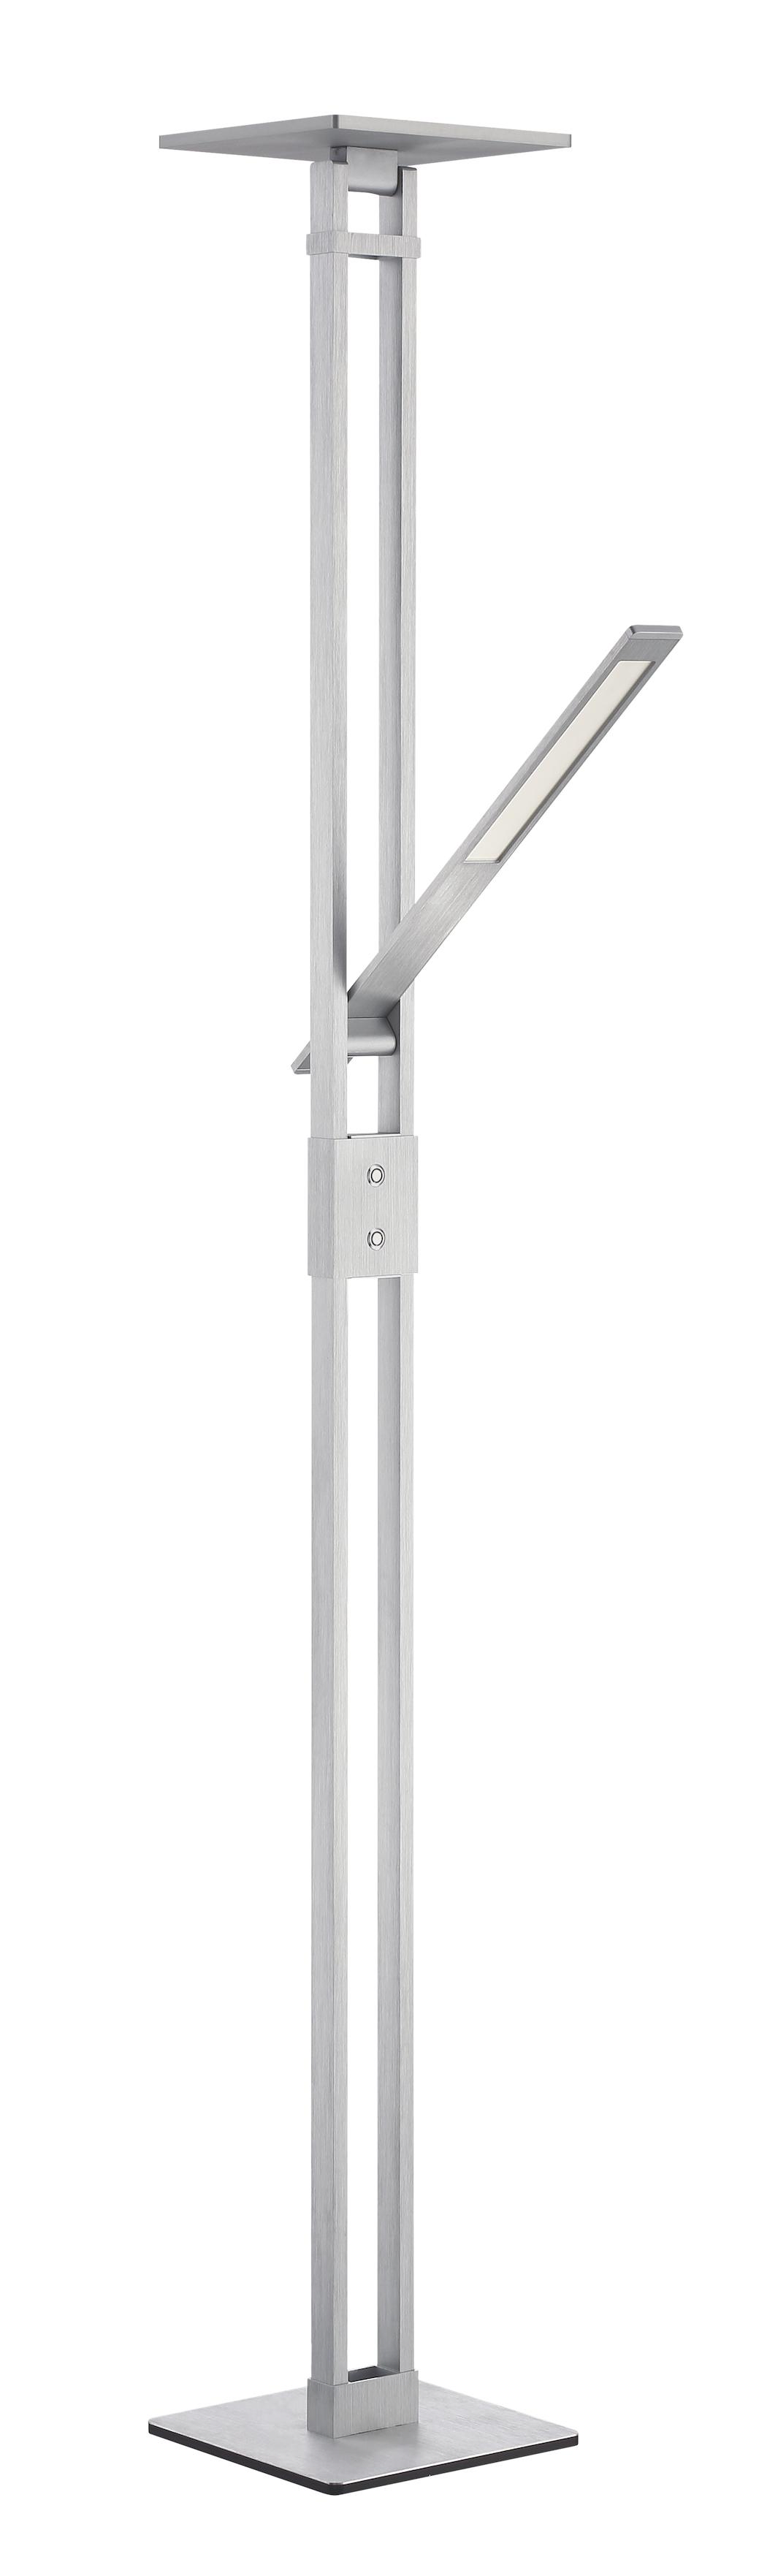 Floor Lamp Modern VARR Kendal TC5001-BAL